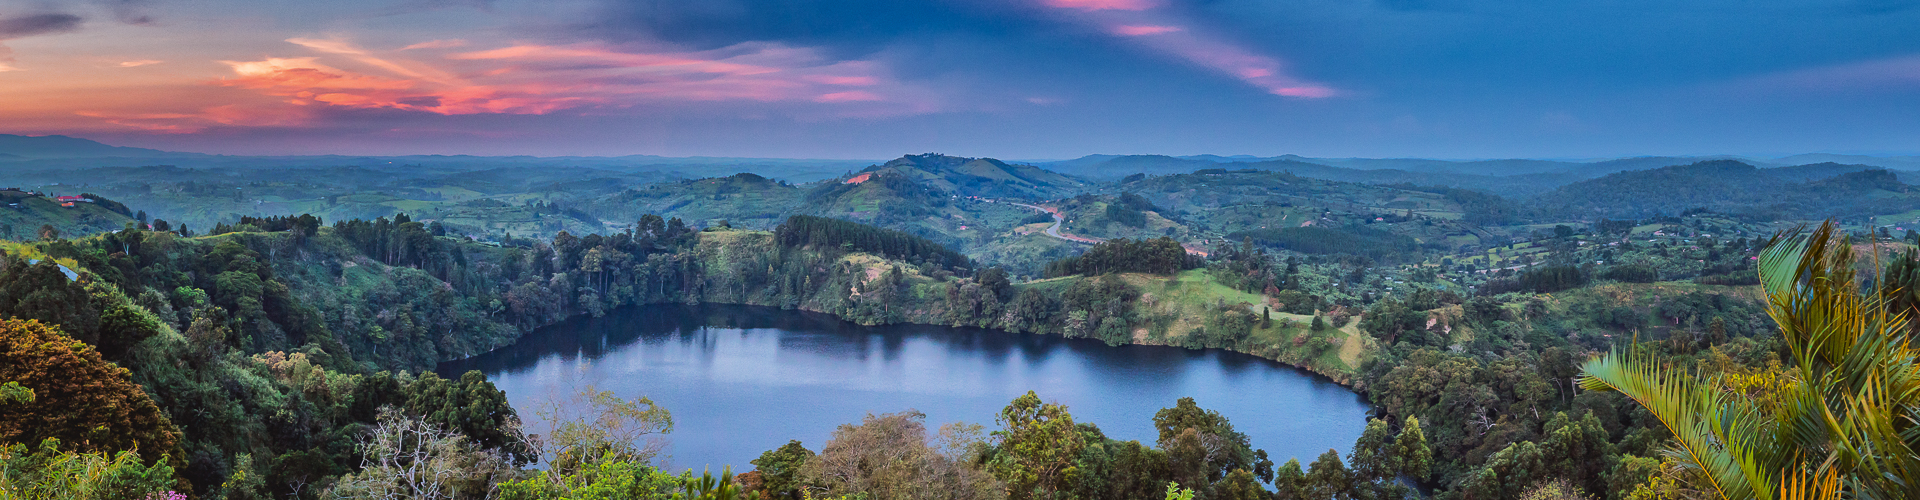 Panorama Photo Lake and Country Side in Uganda